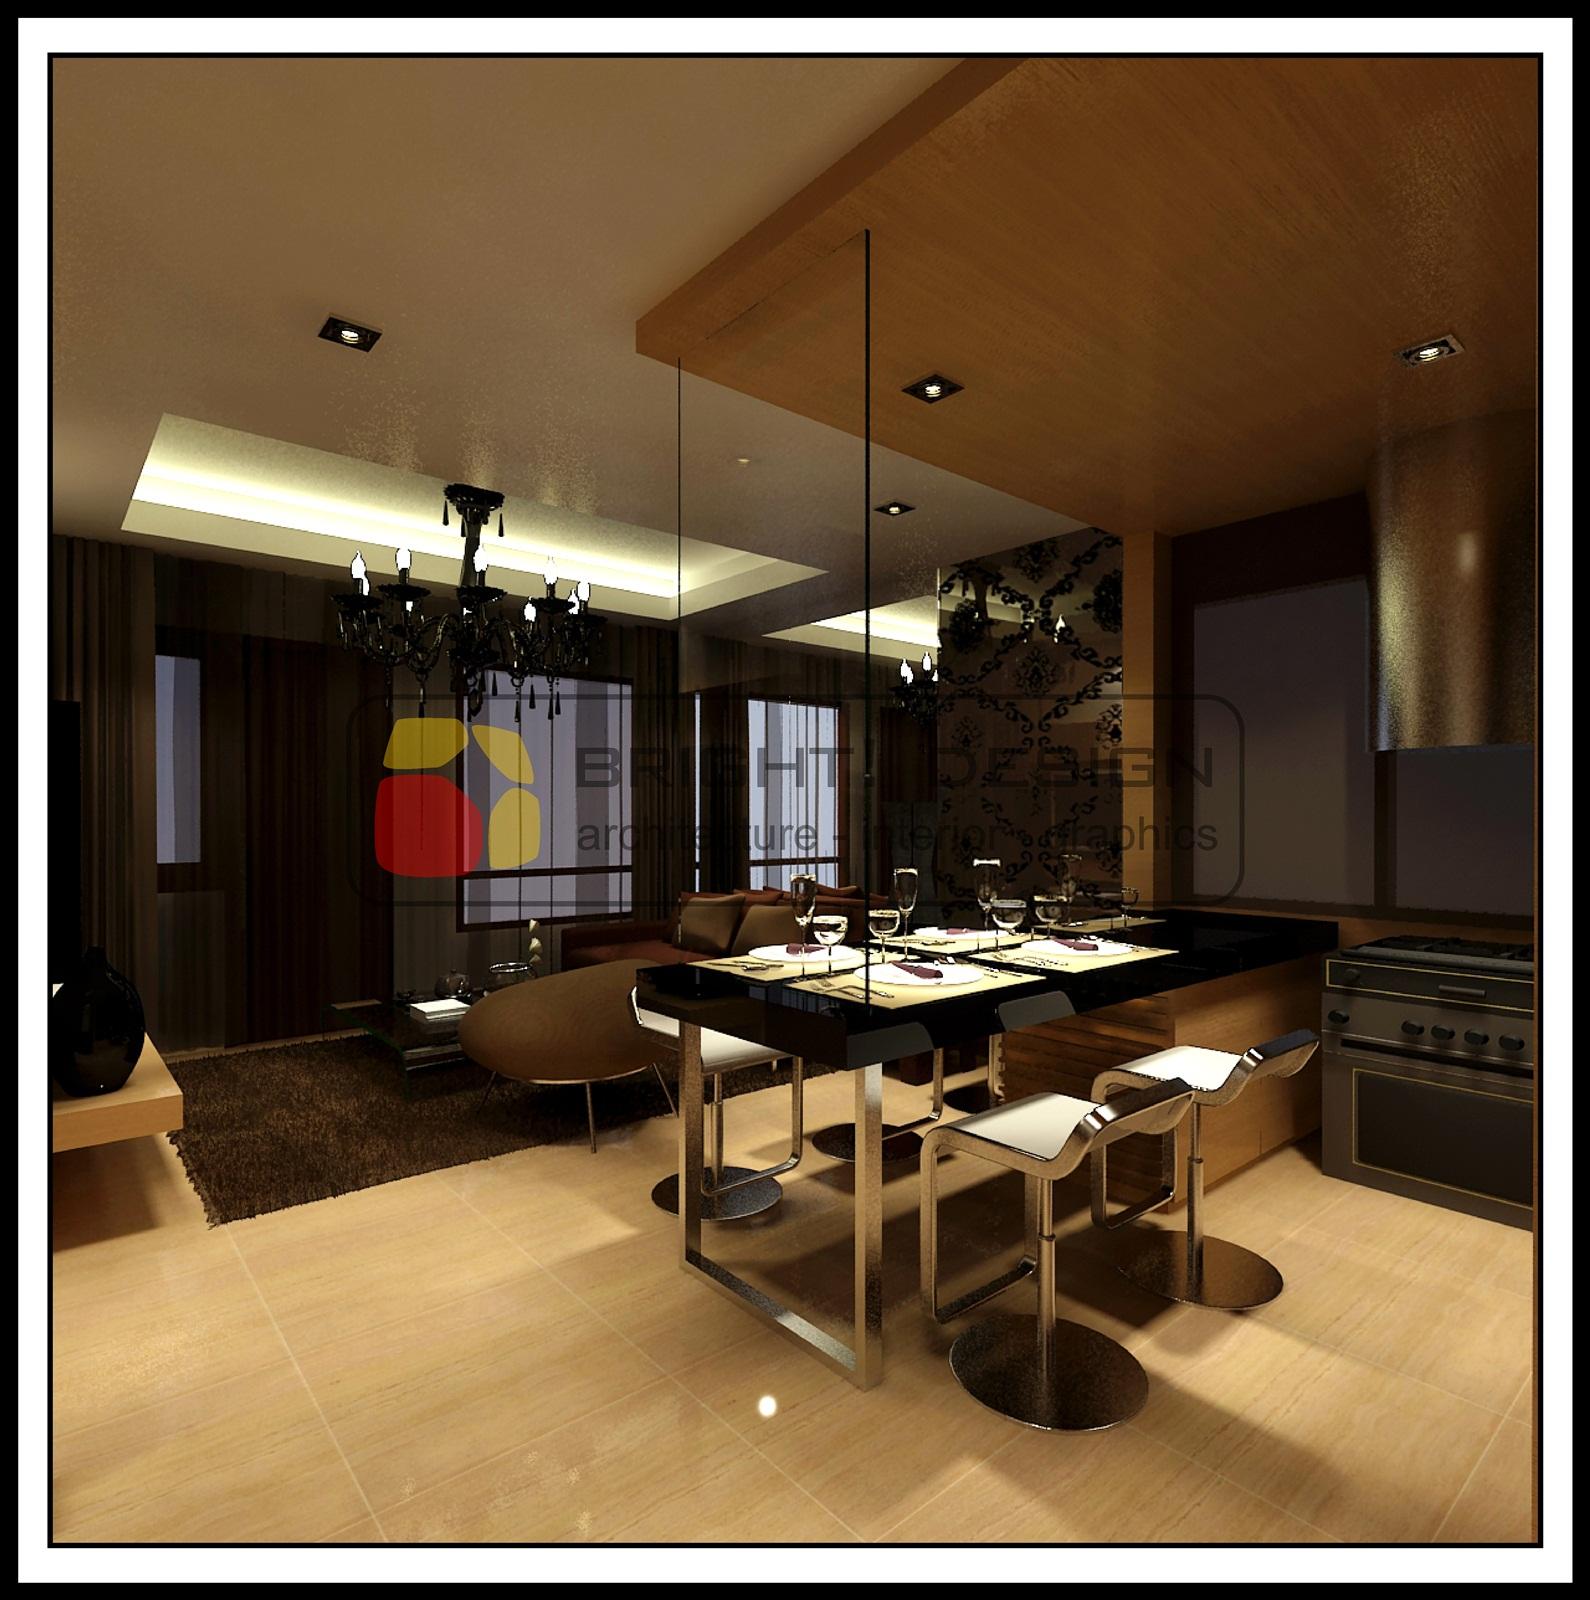 Apartment unit sudirman park apartment jakarta the for Dining room zomato jkt